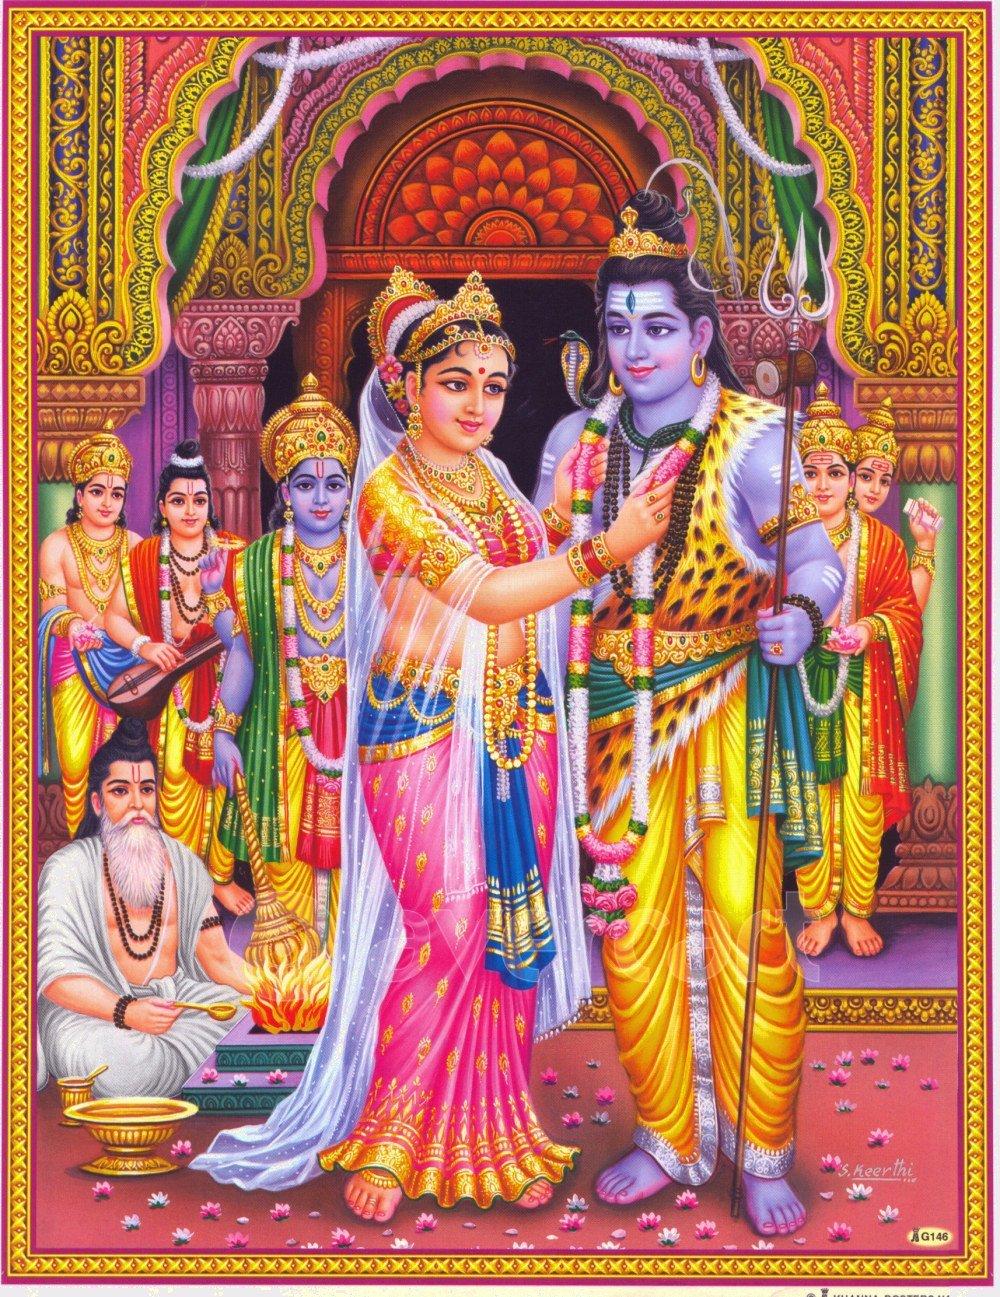 Maha shivaratri images sms collection indian hindu festival